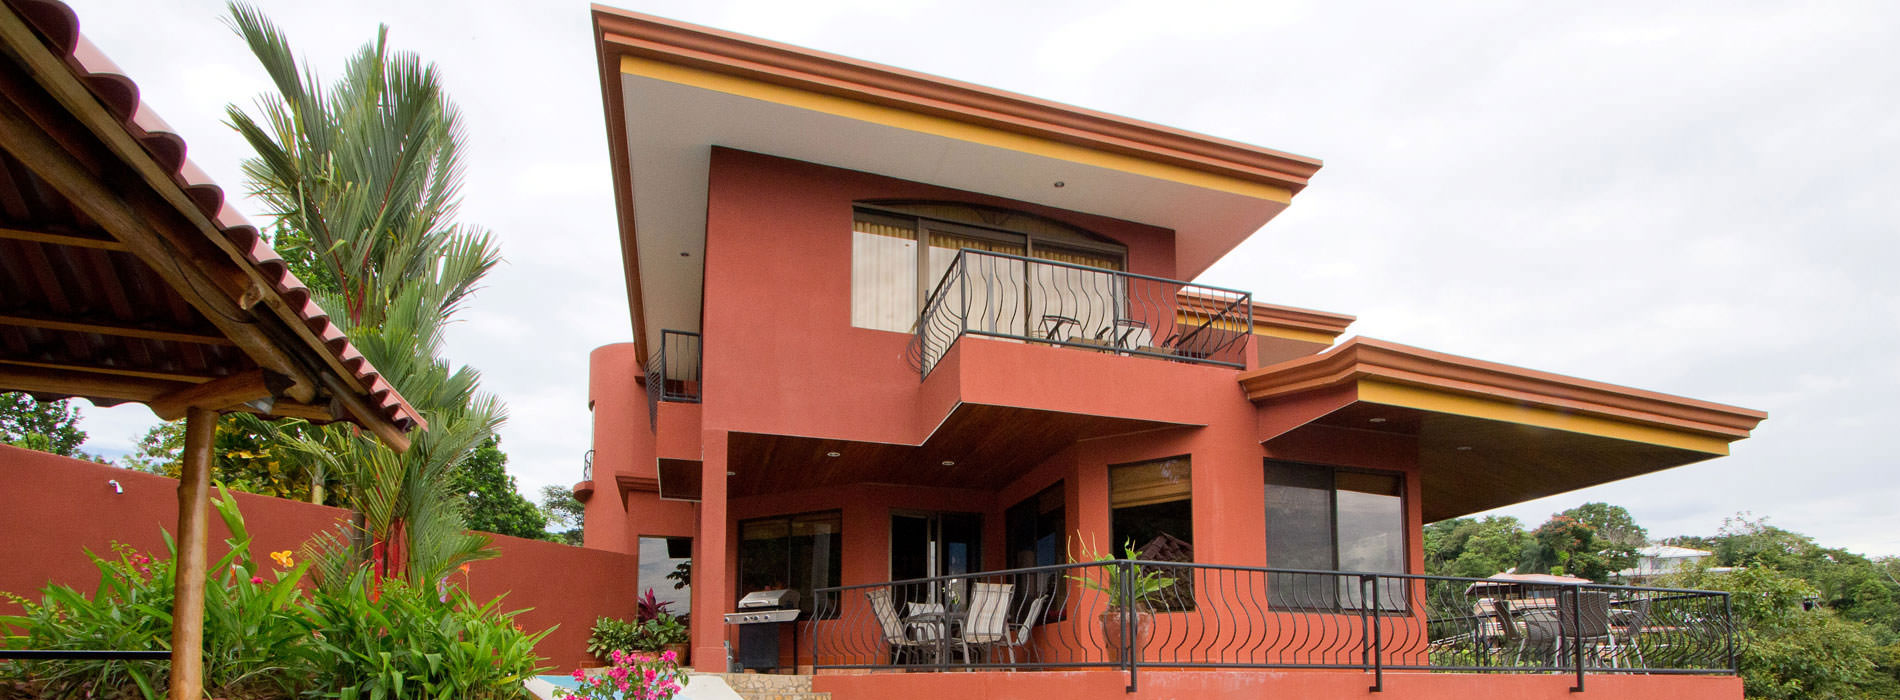 Villa mirador costa rica villa rentals costa rica vacations for Costa rican villas for rent